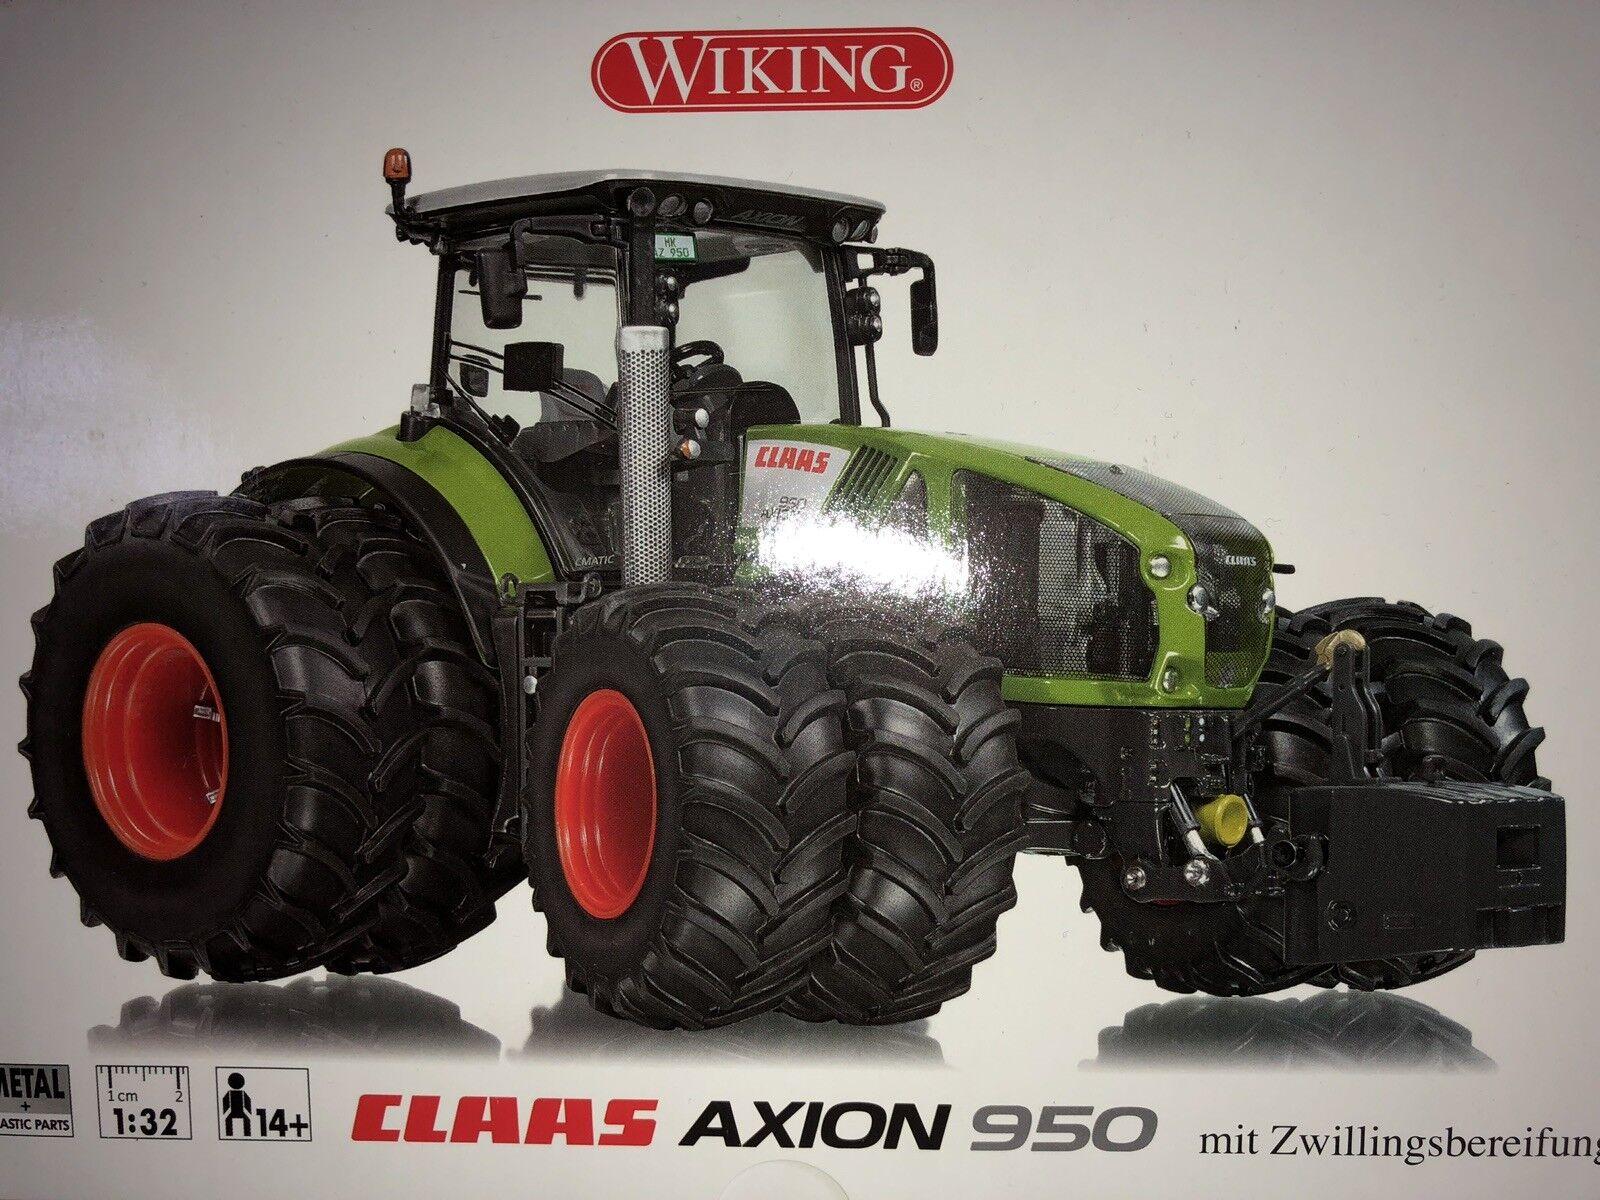 Wiking Wiking Wiking 7328 Traktor Claas Axion 950 Zwillingsbereifung 132 Landwirtschaftsfahrze  | Gute Qualität  587218